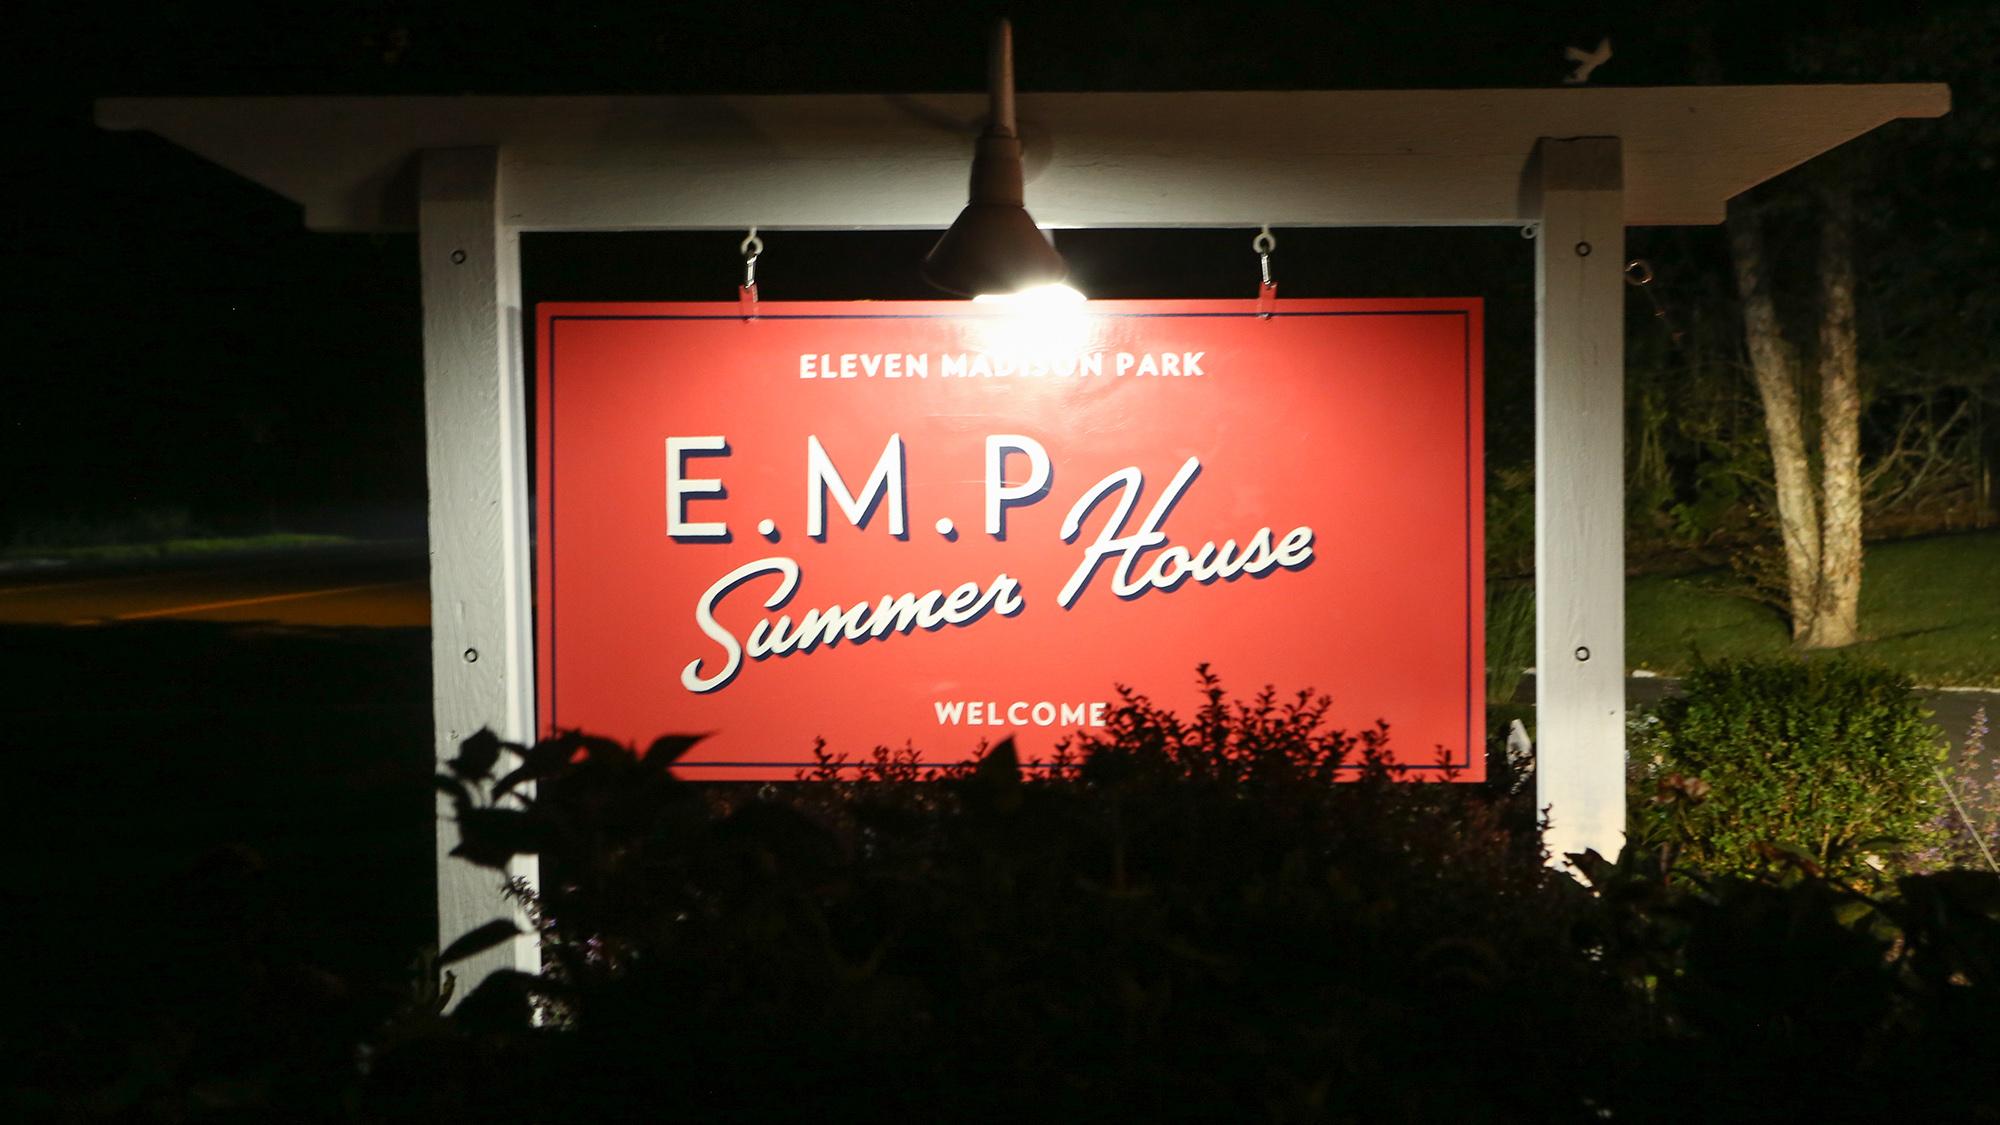 American Express Platinum x EMP Summer House : Opening Celebration